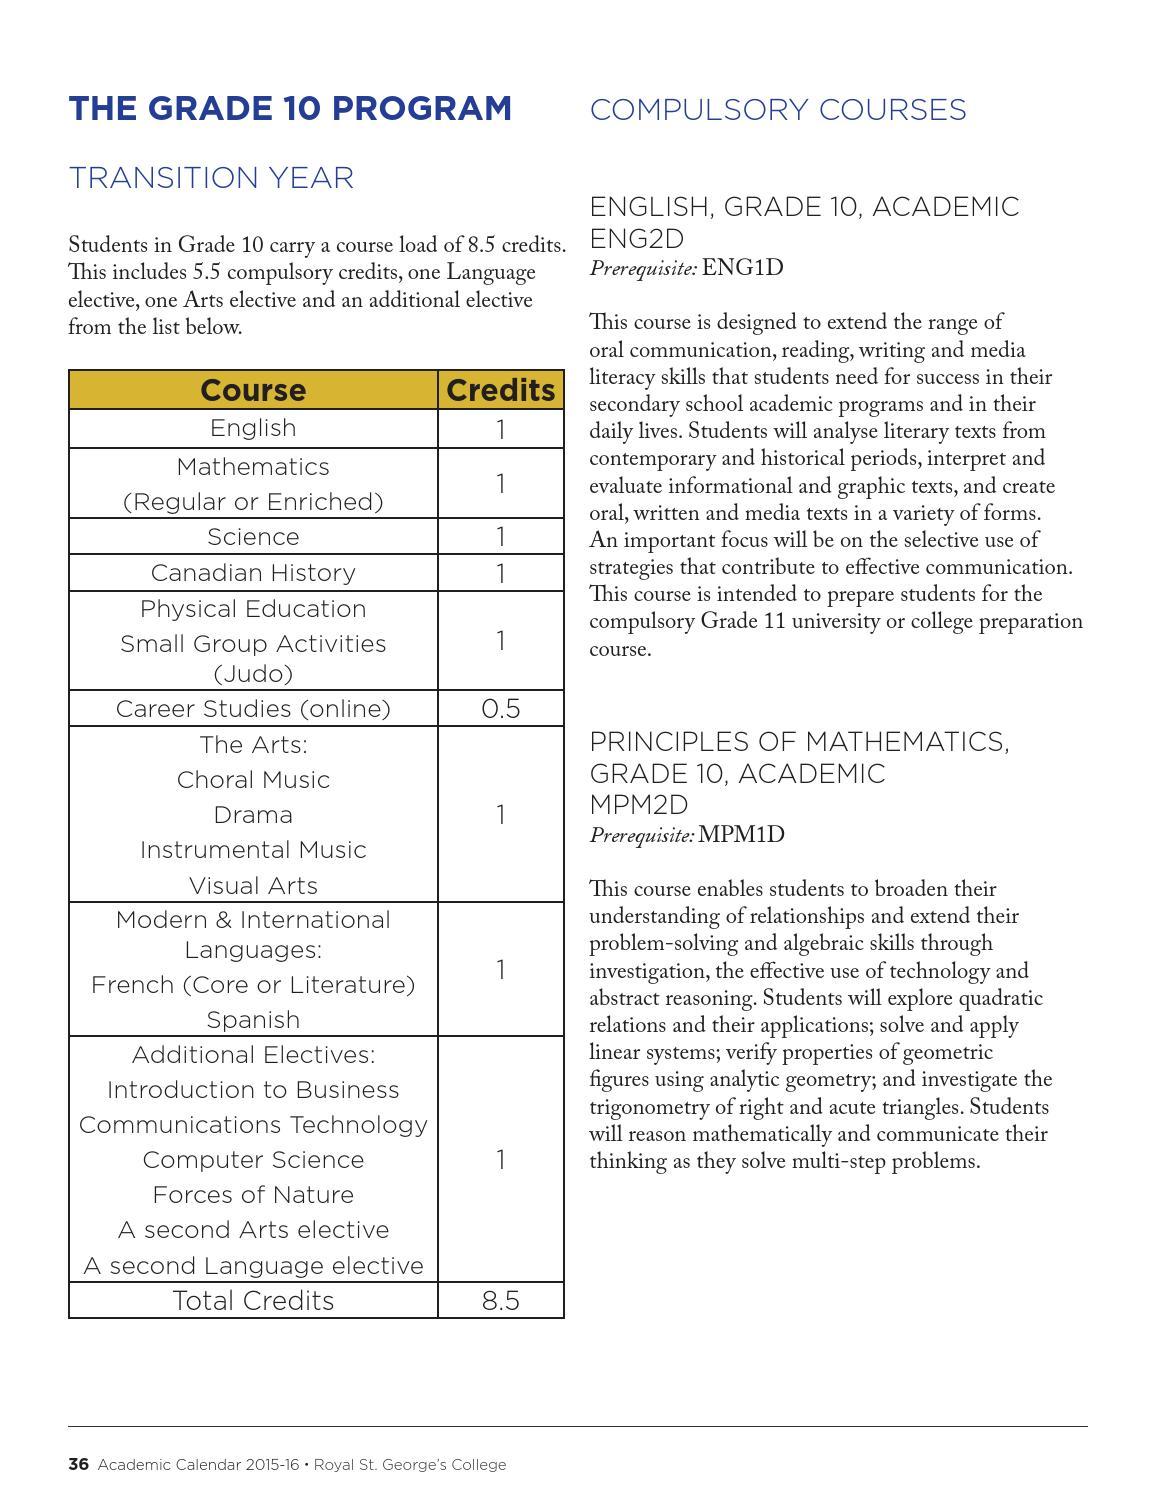 2015/16 Academic Calendar by Royal St  George's College - issuu